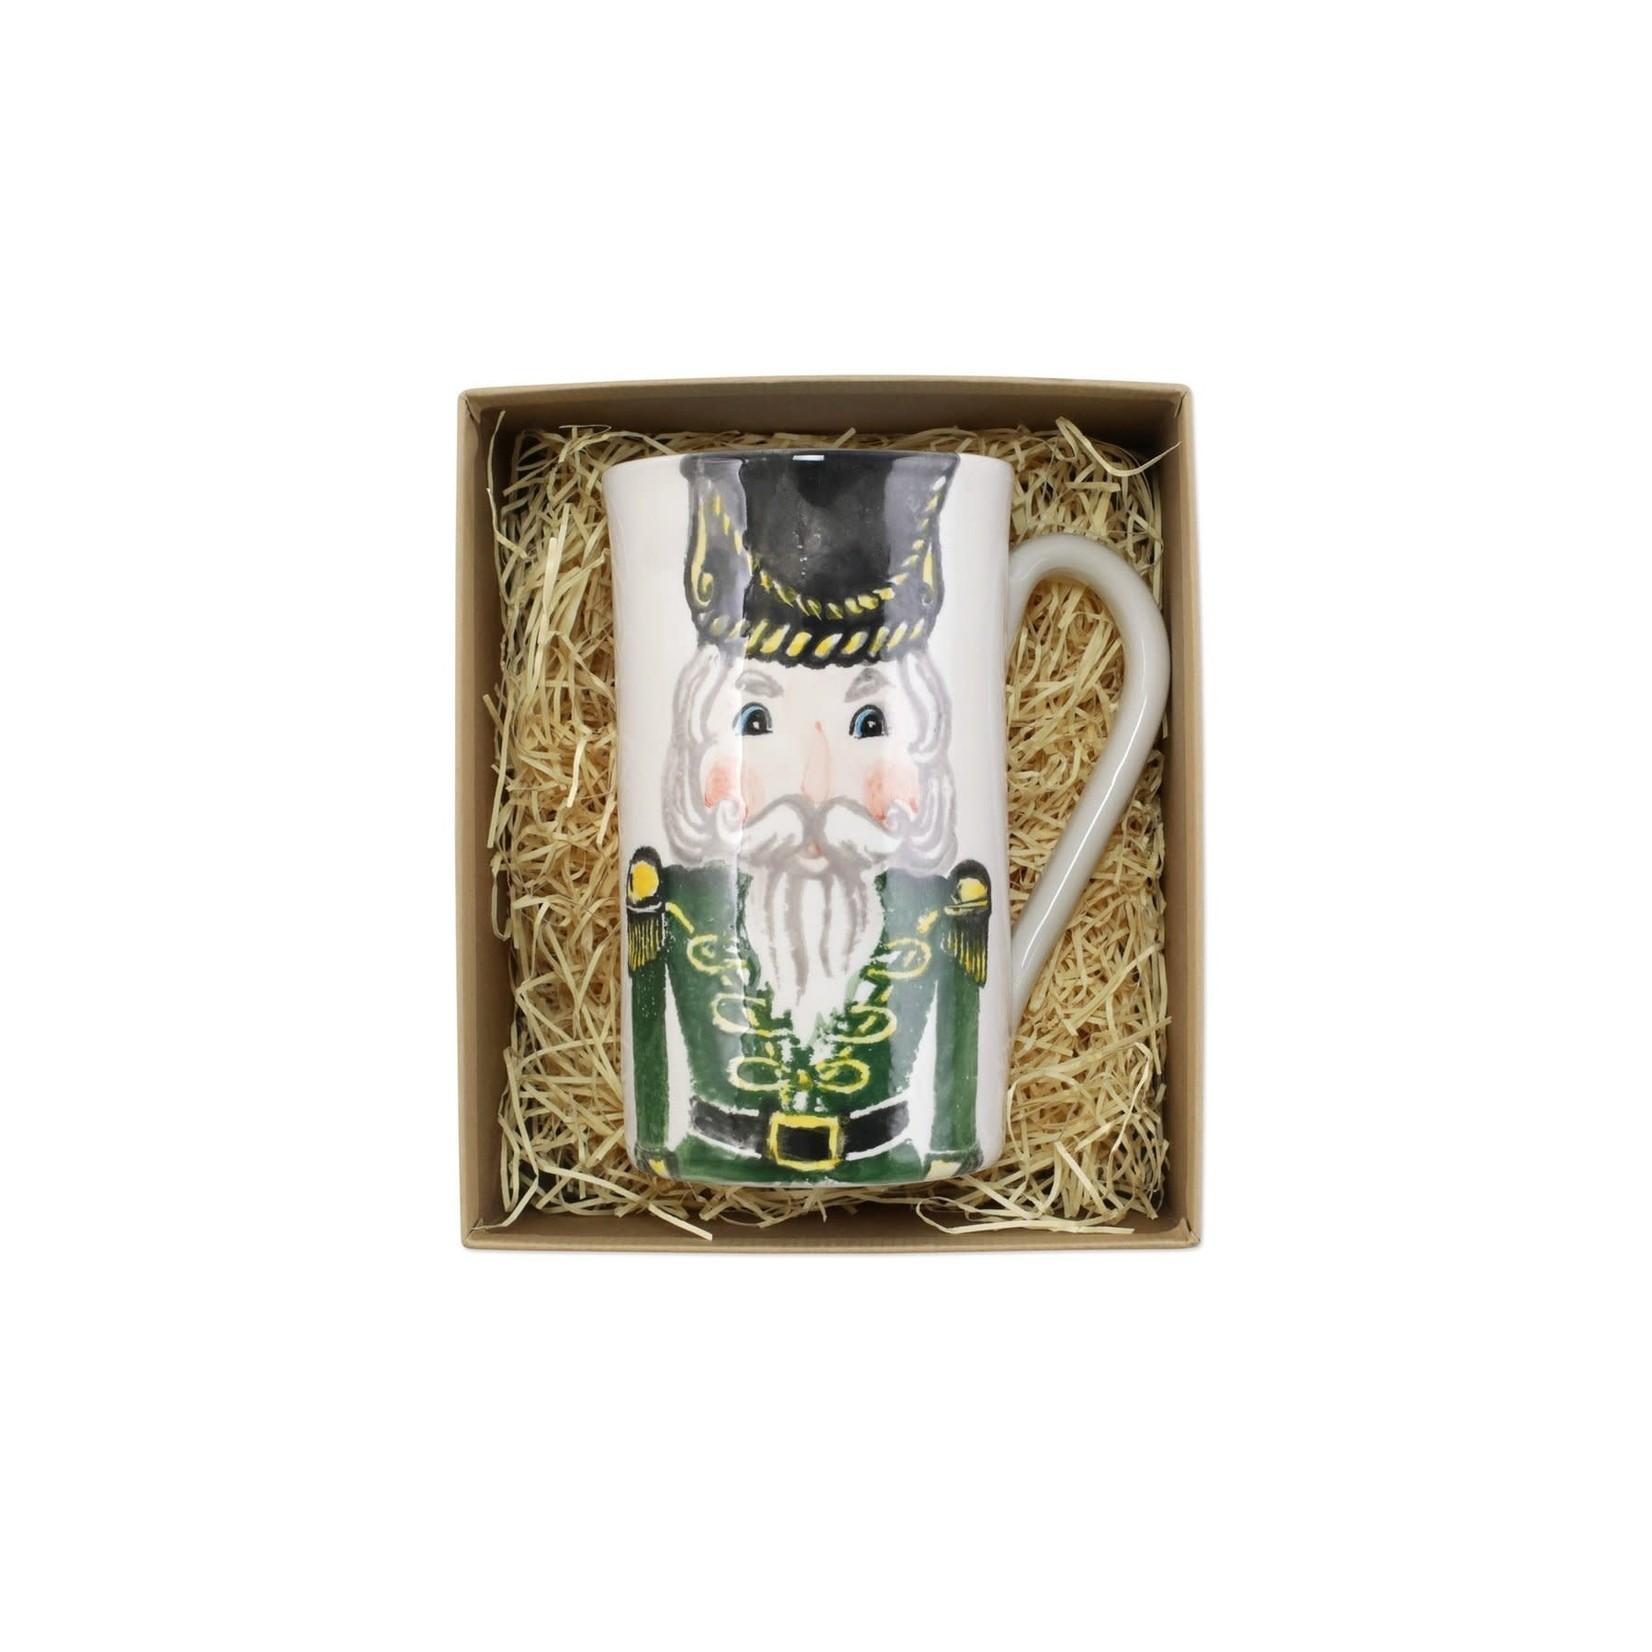 Nutcracker Latte Mug w/ Soldier